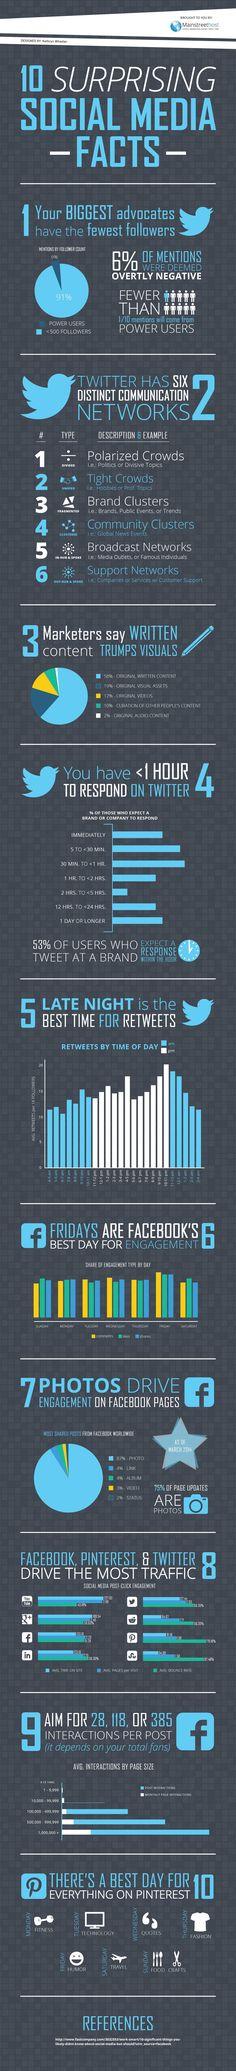 10 Surprising Facebook, Twitter, #Pinterest Facts — #SocialMedia Statistics 2014 — #infographic